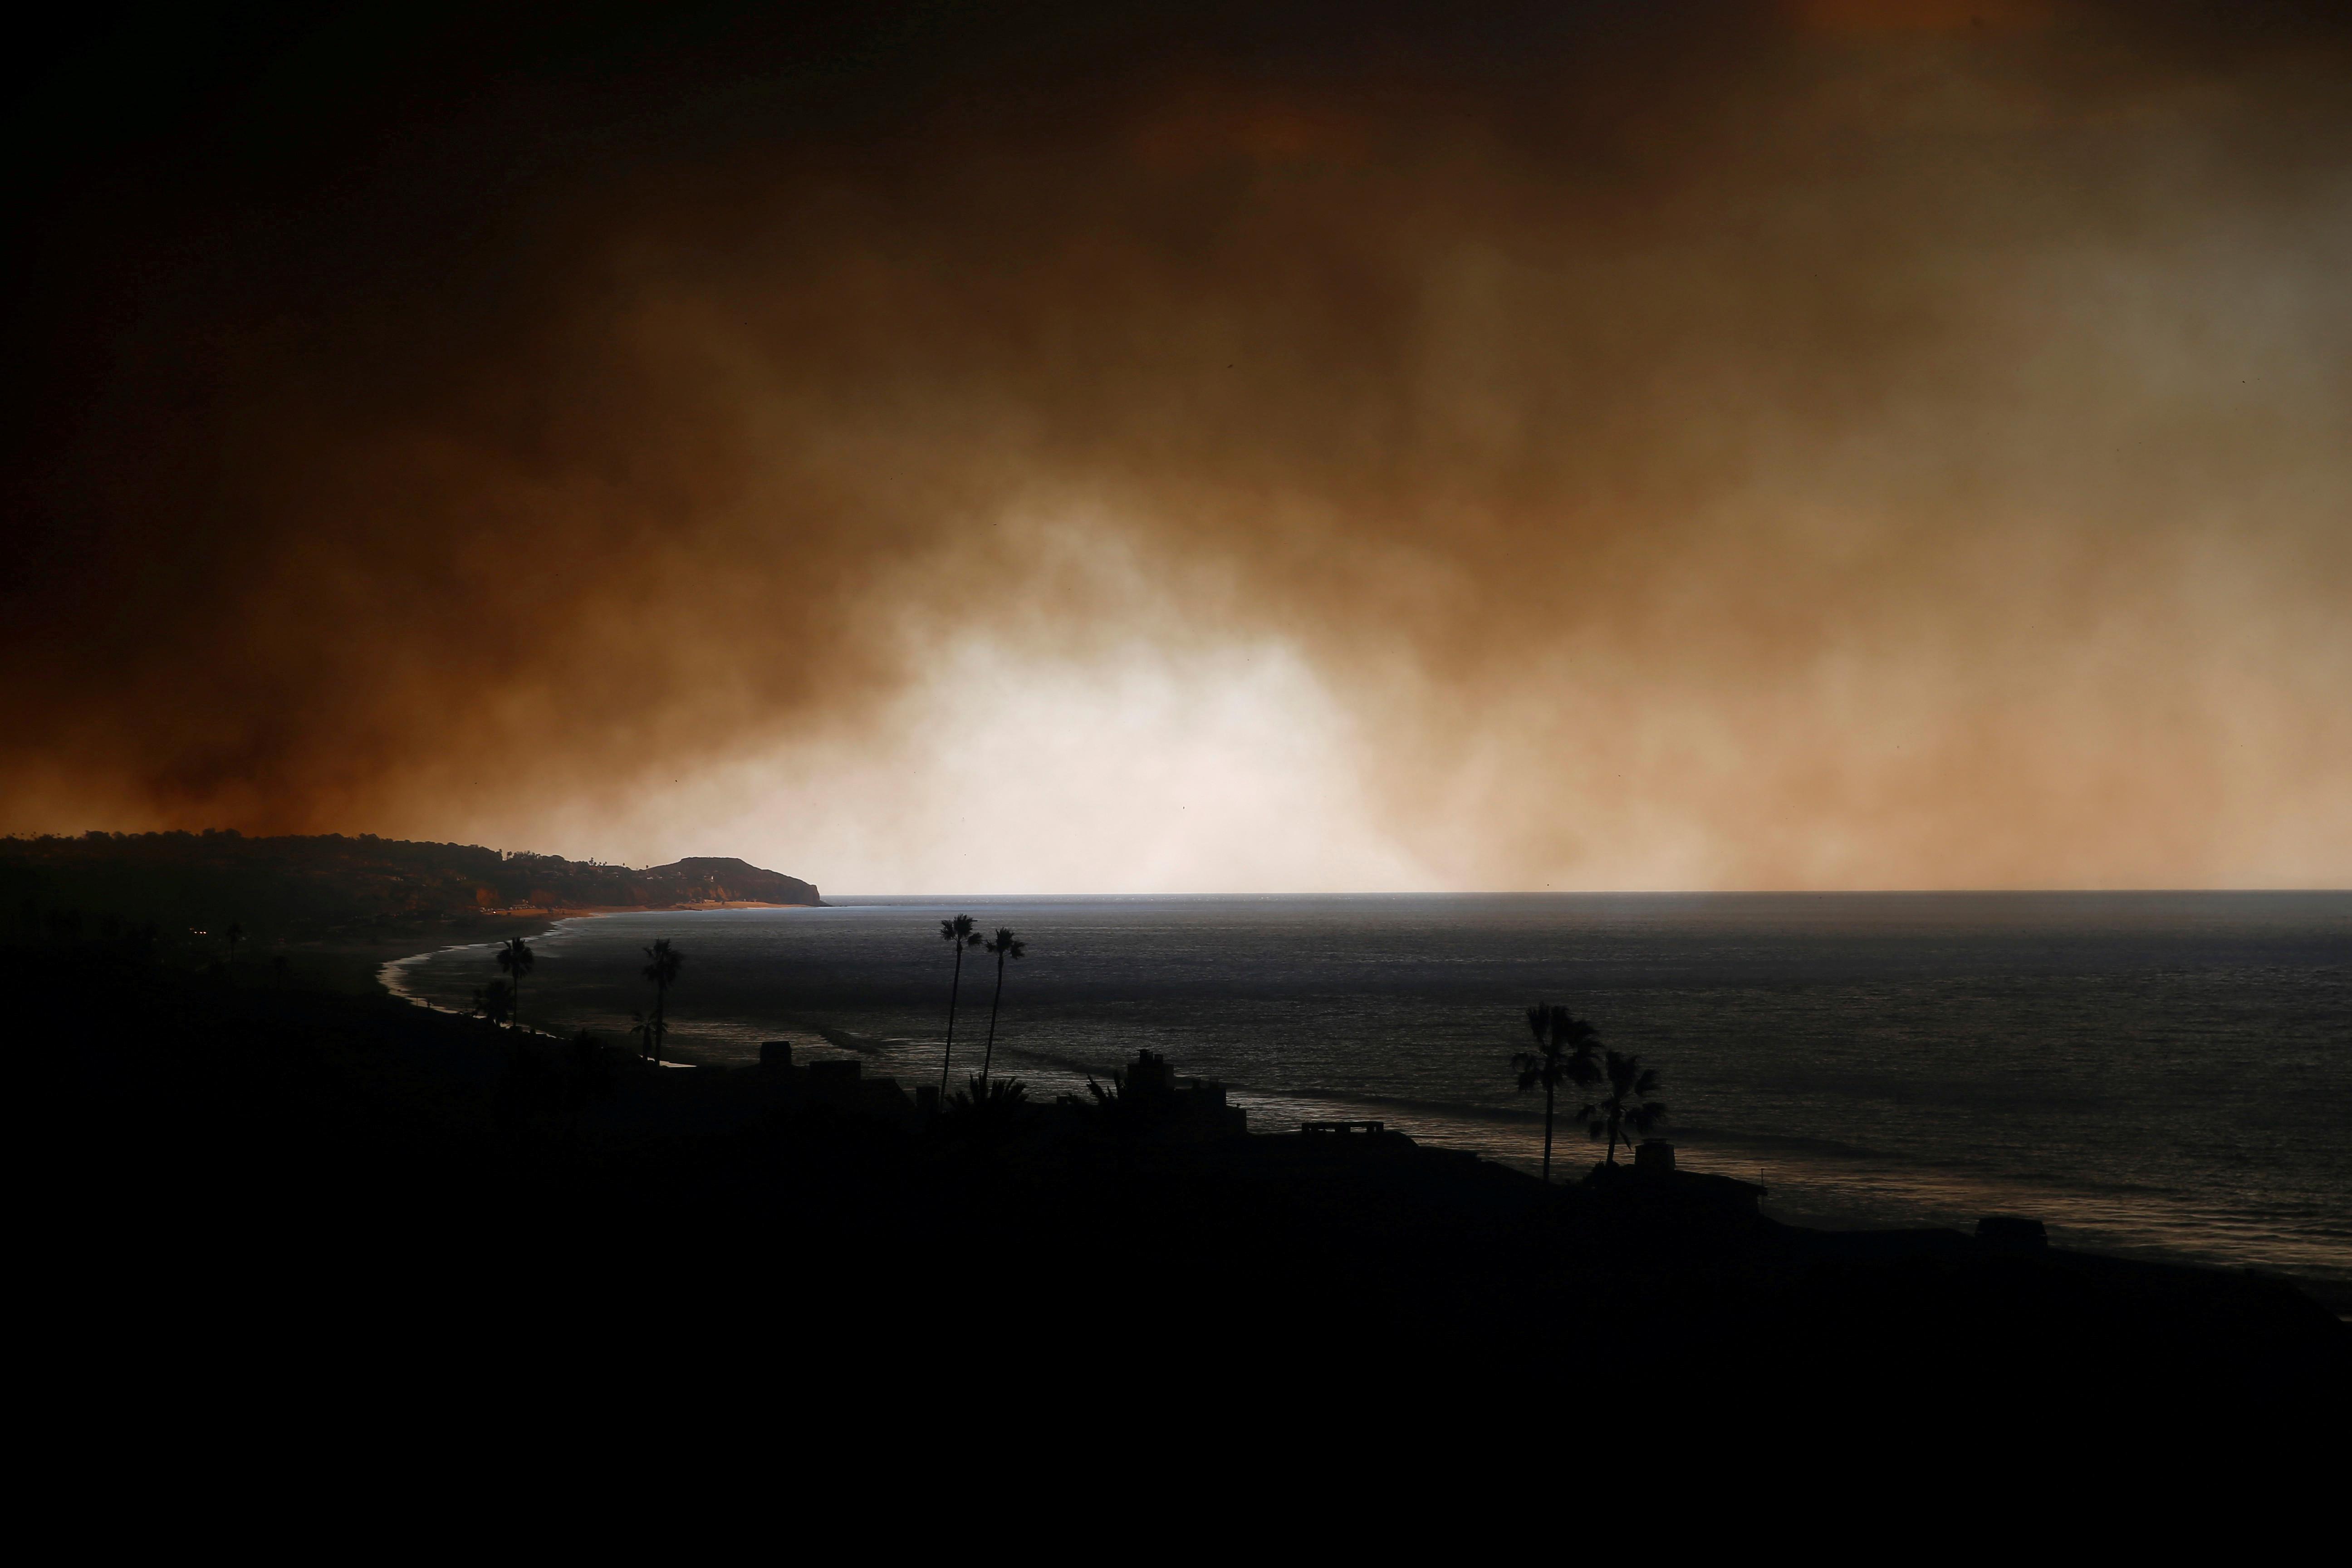 Smoke is seen over the ocean as the Woolsey Fire burns in Malibu, California, U.S. November 9, 2018. REUTERS/Eric Thayer - RC1FA4B53DA0